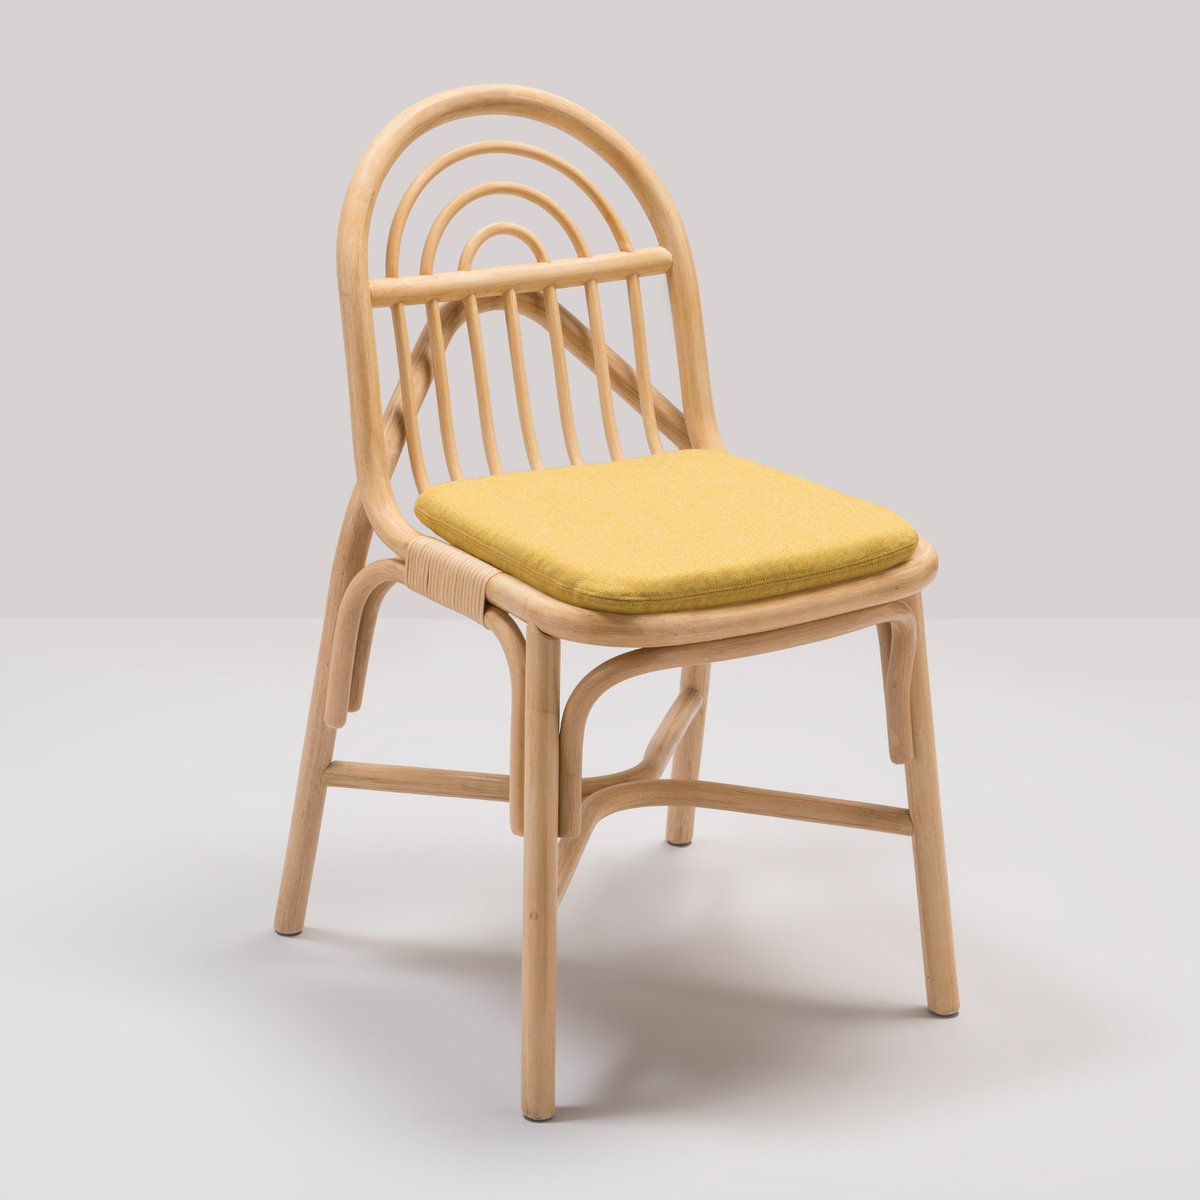 Chaise sillon en rotin avec coussin en tissu gabriel jaune - Chaise en rotin ...